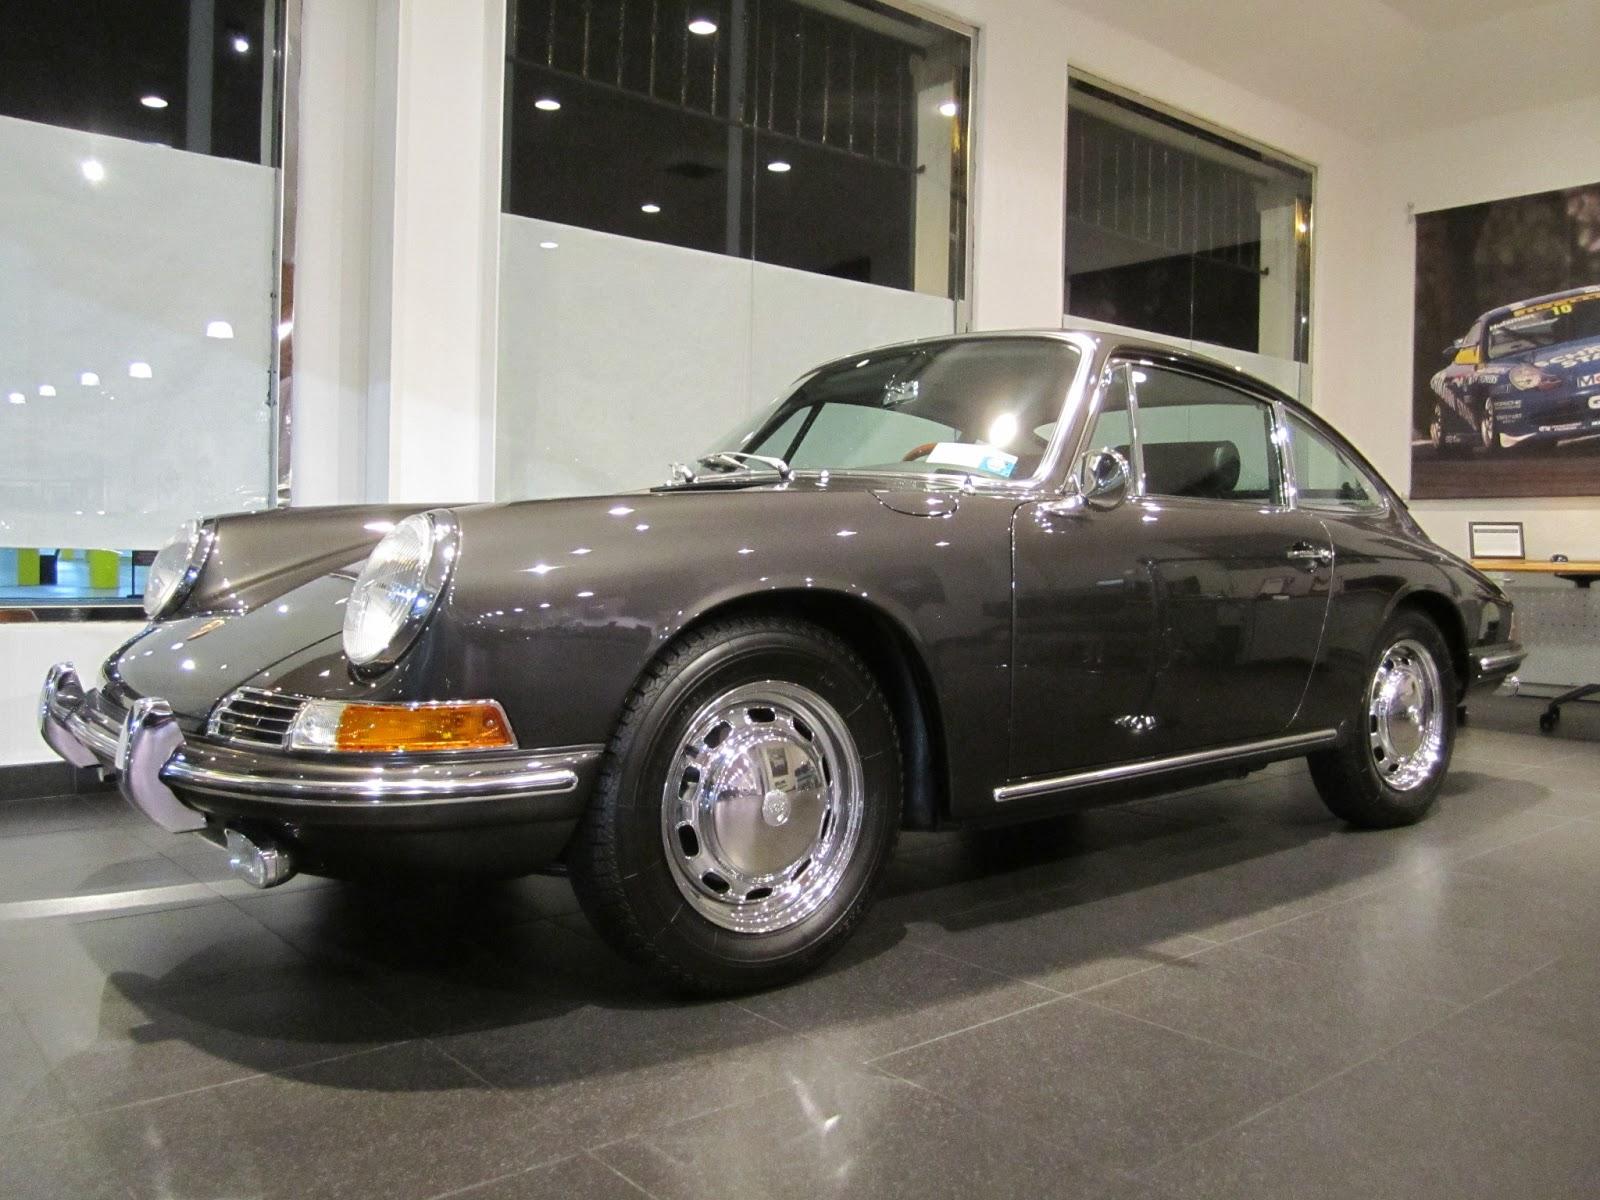 Beverly Hills Porsche Official Blog Porsche Quot The Quot Sports Car Celebrates A Special Anniversary